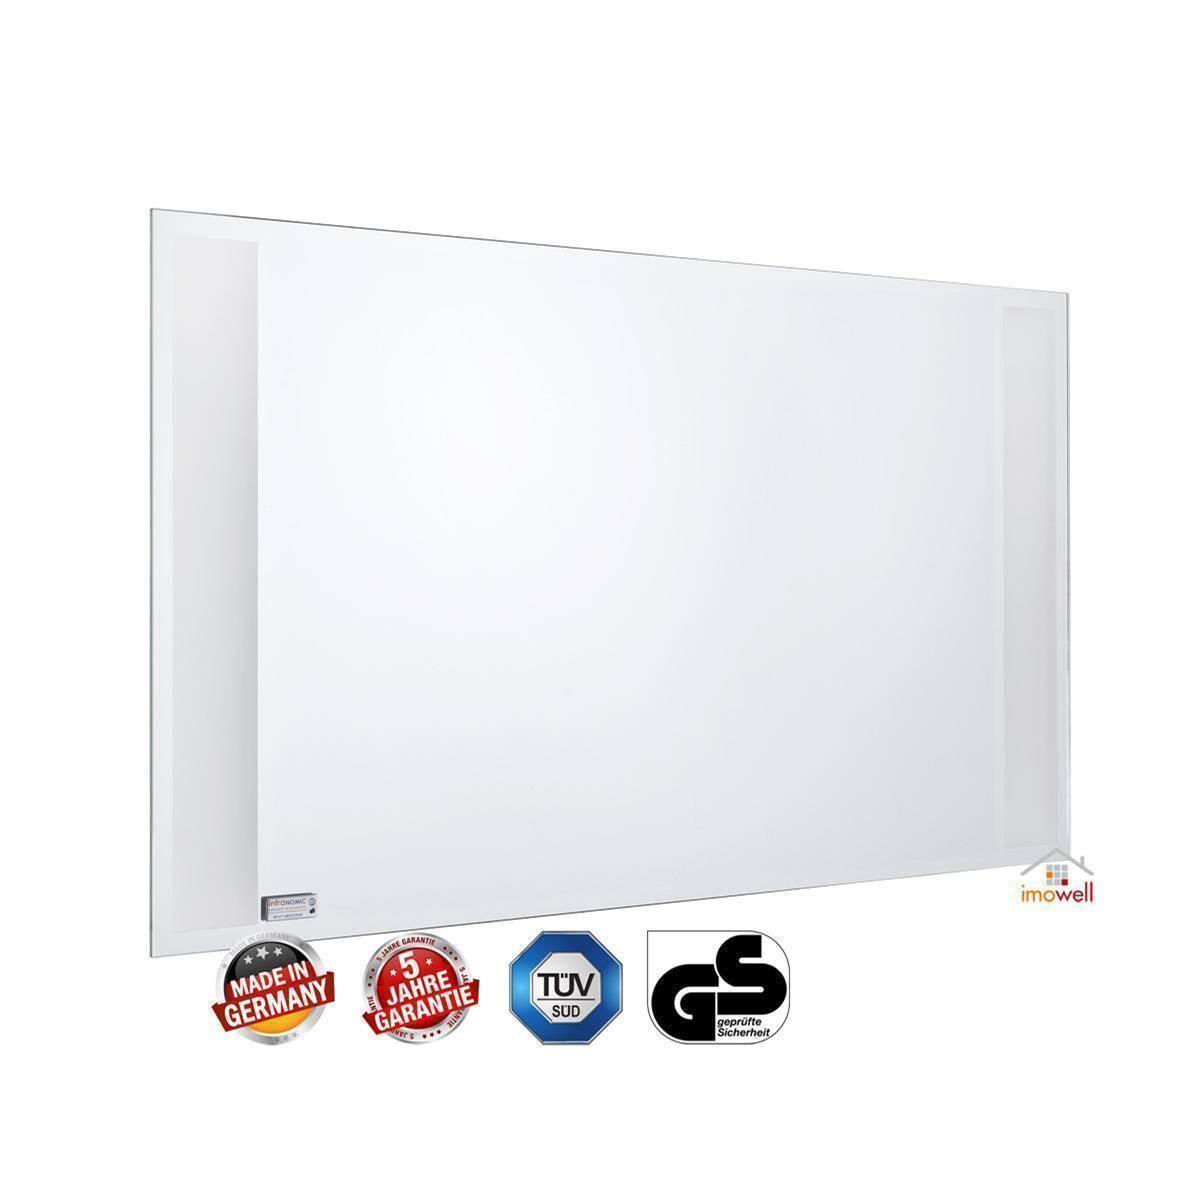 rahmenlose infrarot spiegelheizung nomic star 400 watt. Black Bedroom Furniture Sets. Home Design Ideas